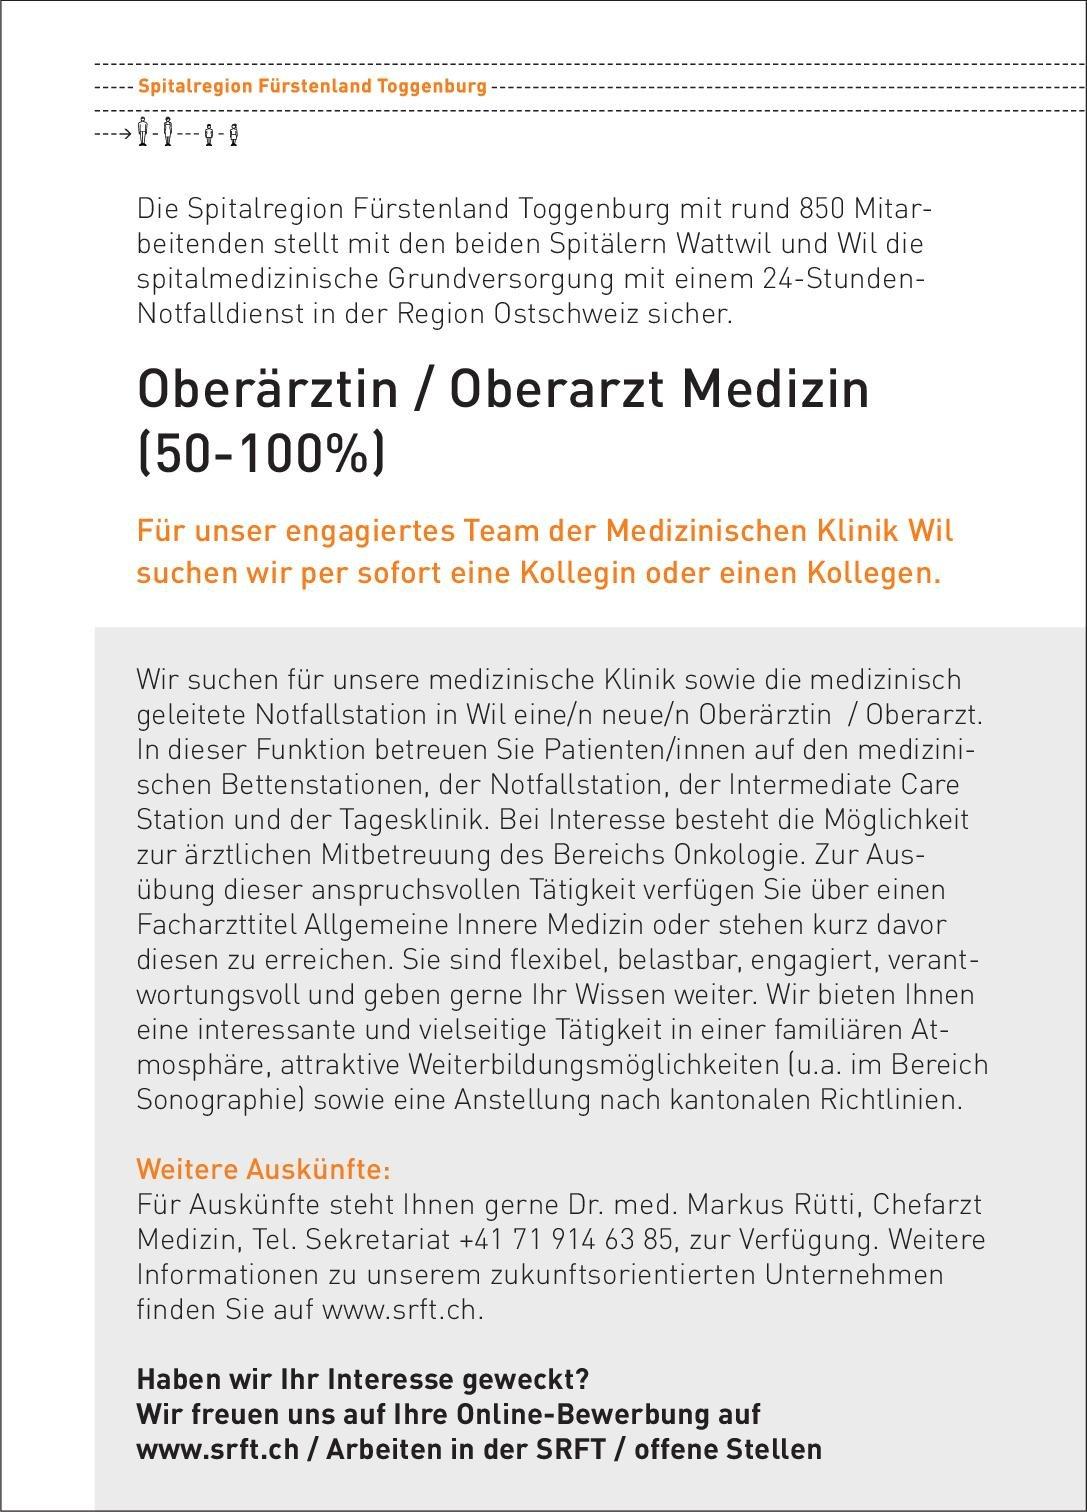 Spitalregion Fürstenland Toggenburg Oberärztin/Oberarzt Medizin (50-100%) Notfallmedizin Oberarzt